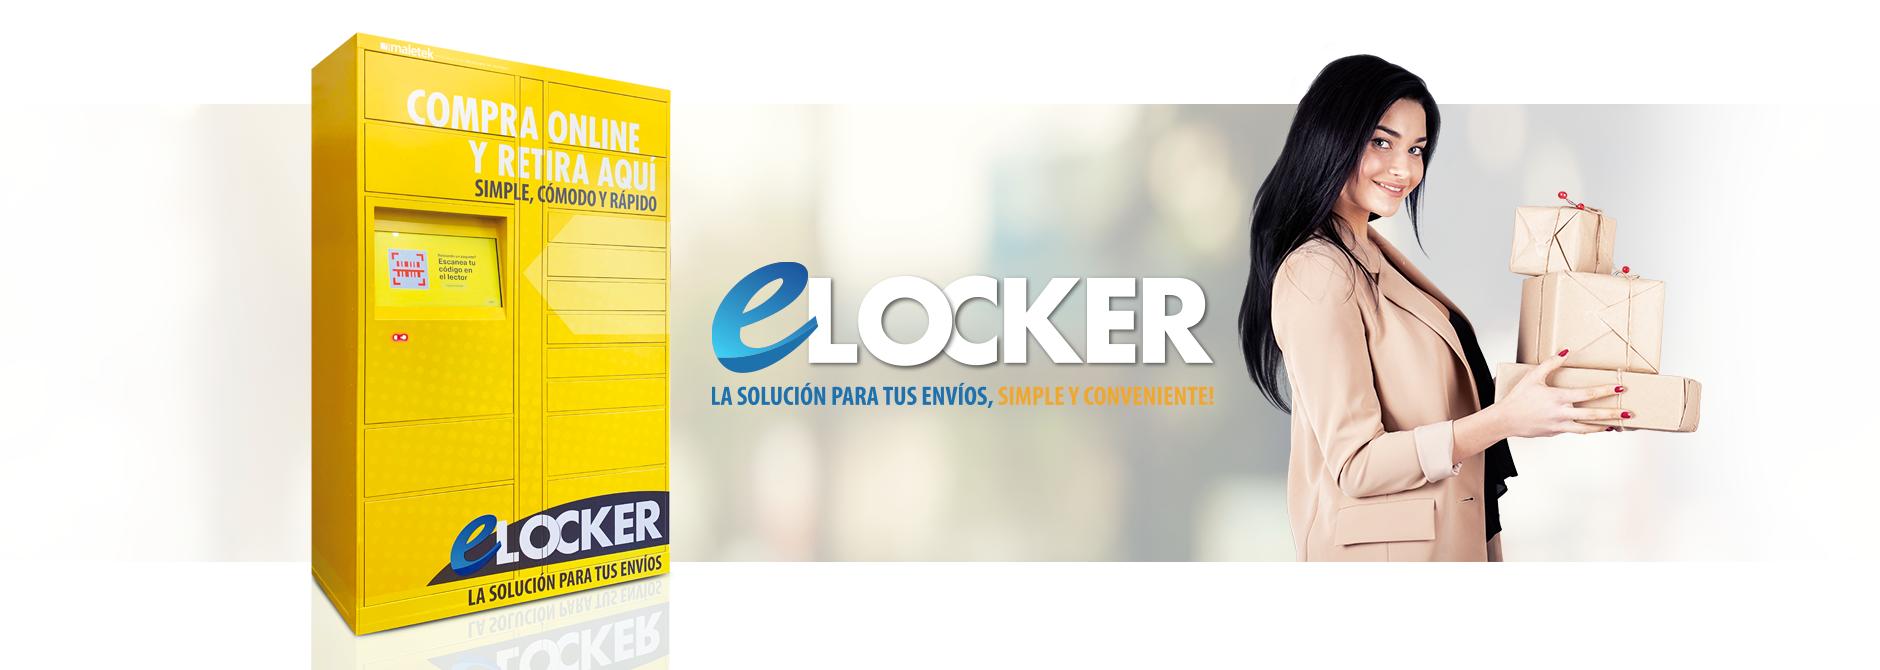 https://maletek.cl/content/uploads/2020/02/1920-elocker-1.png